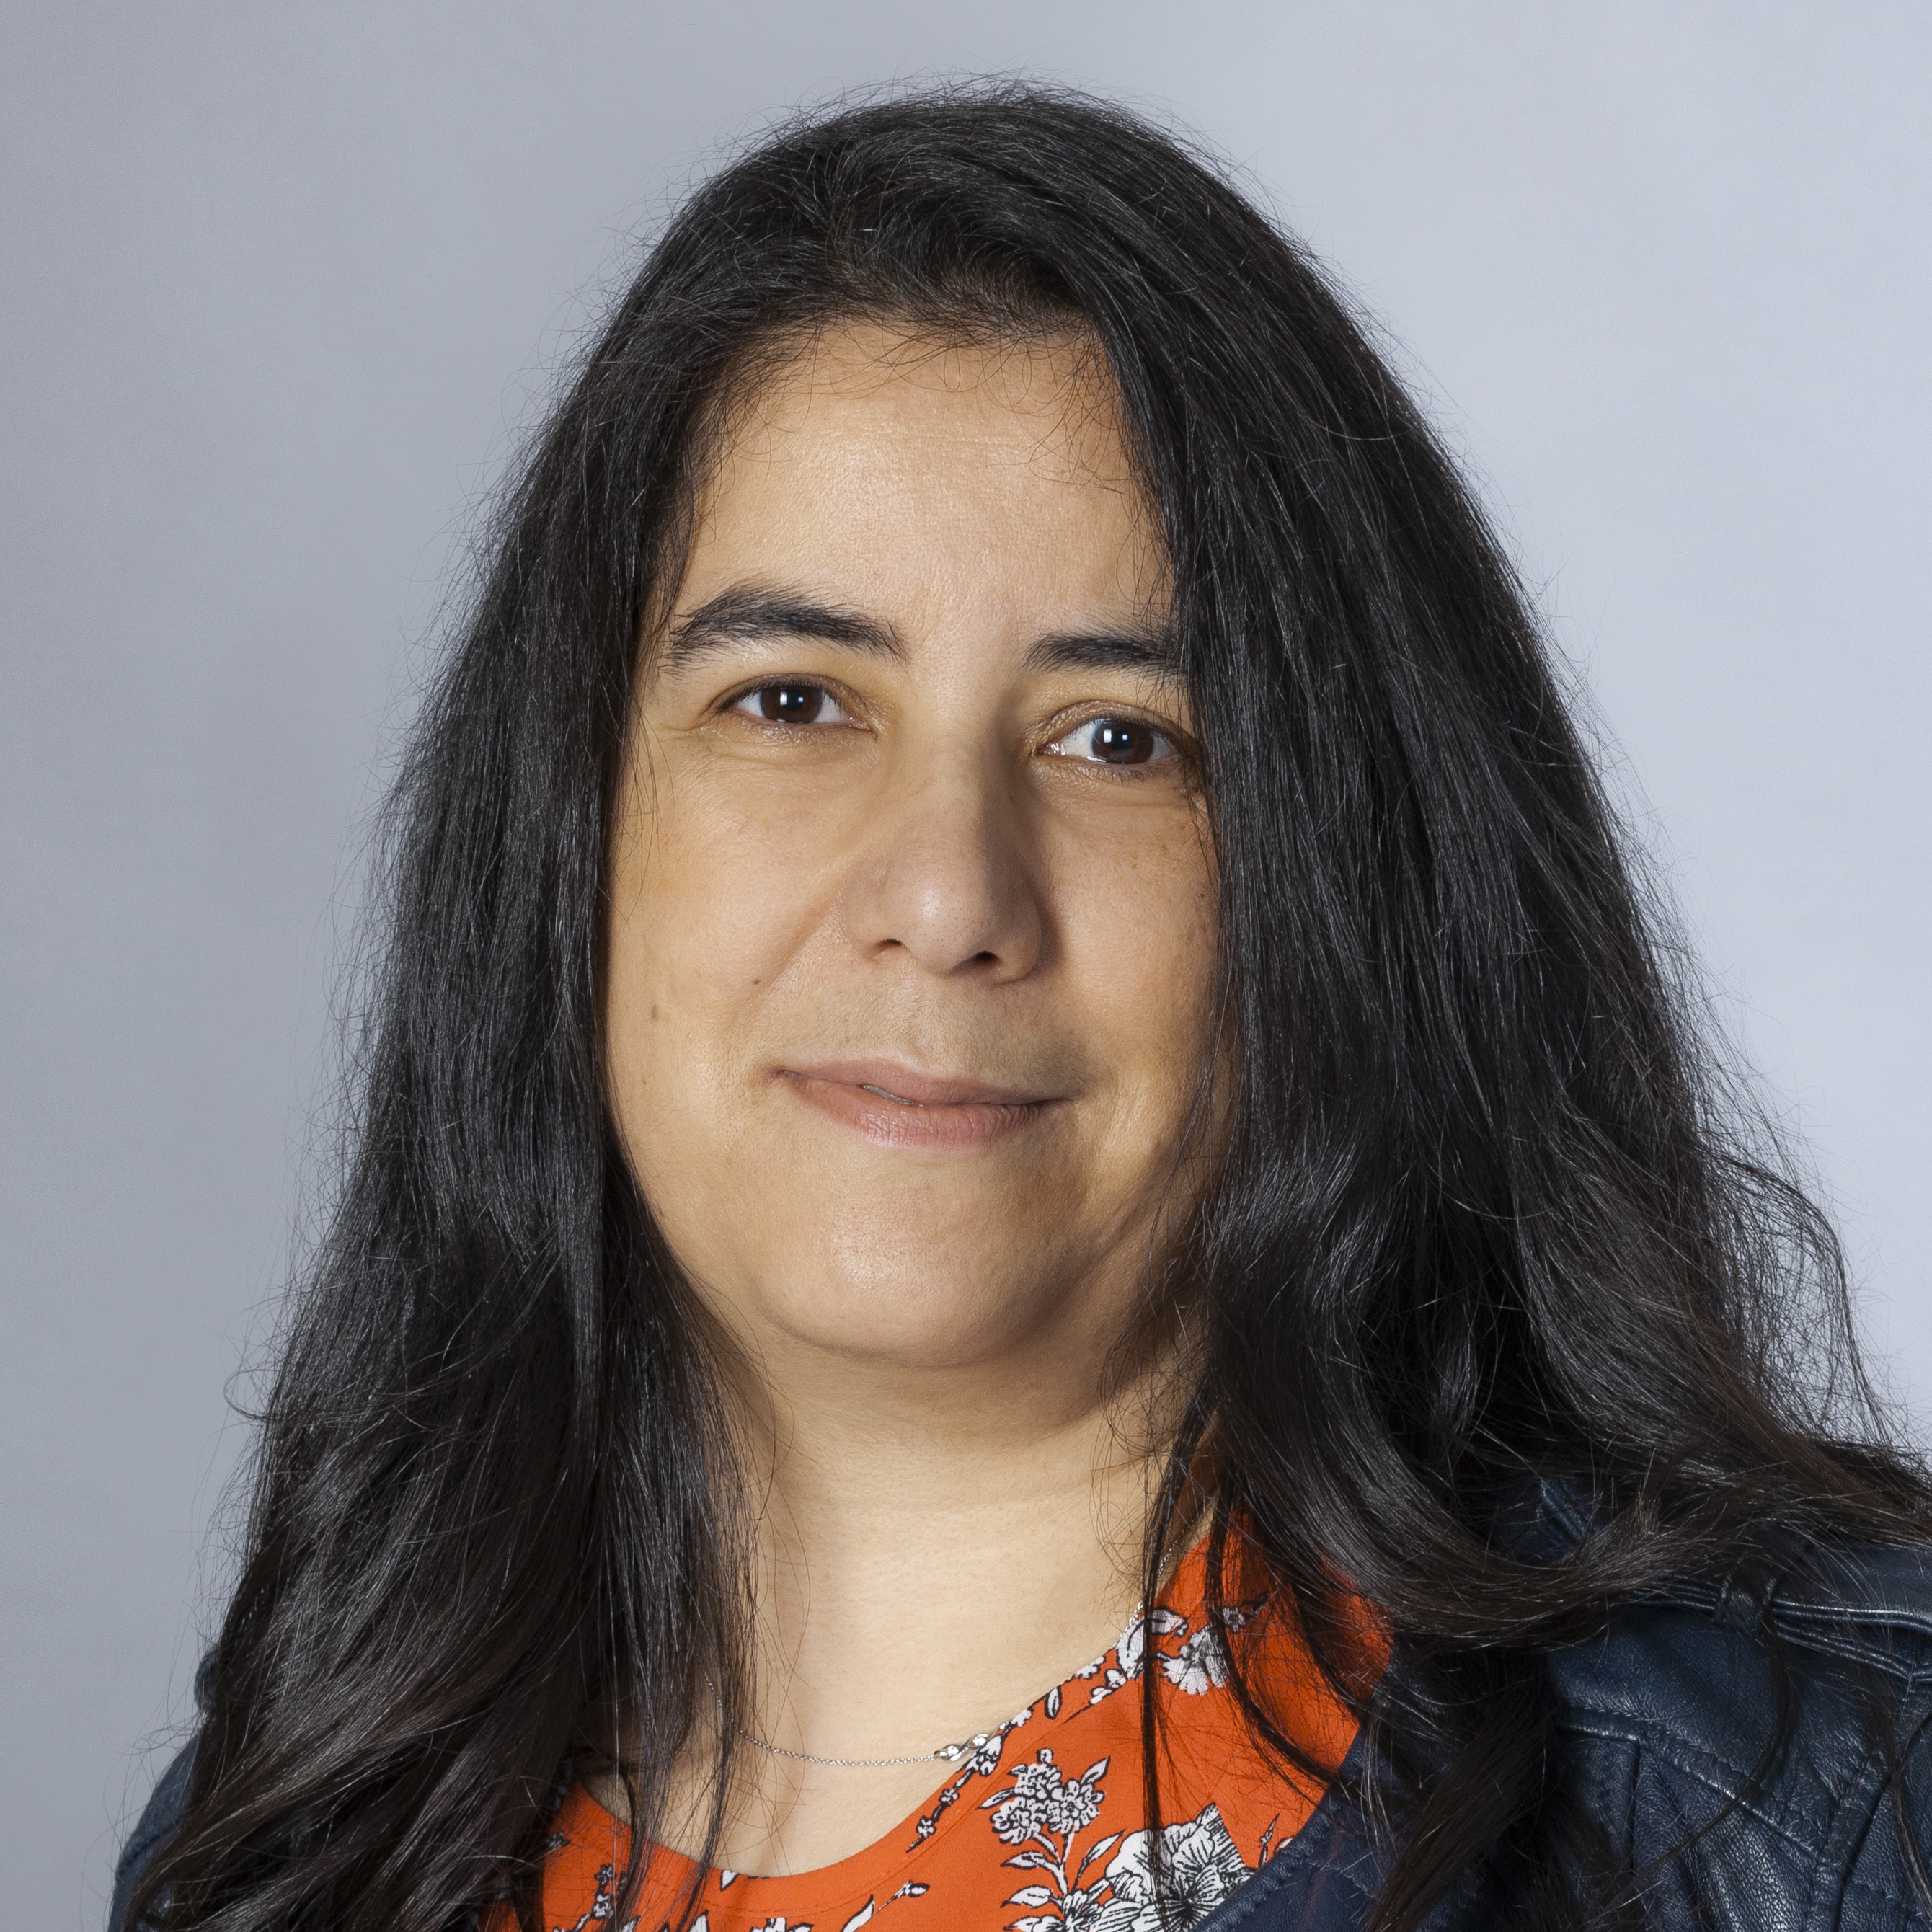 Yasmina Azibi